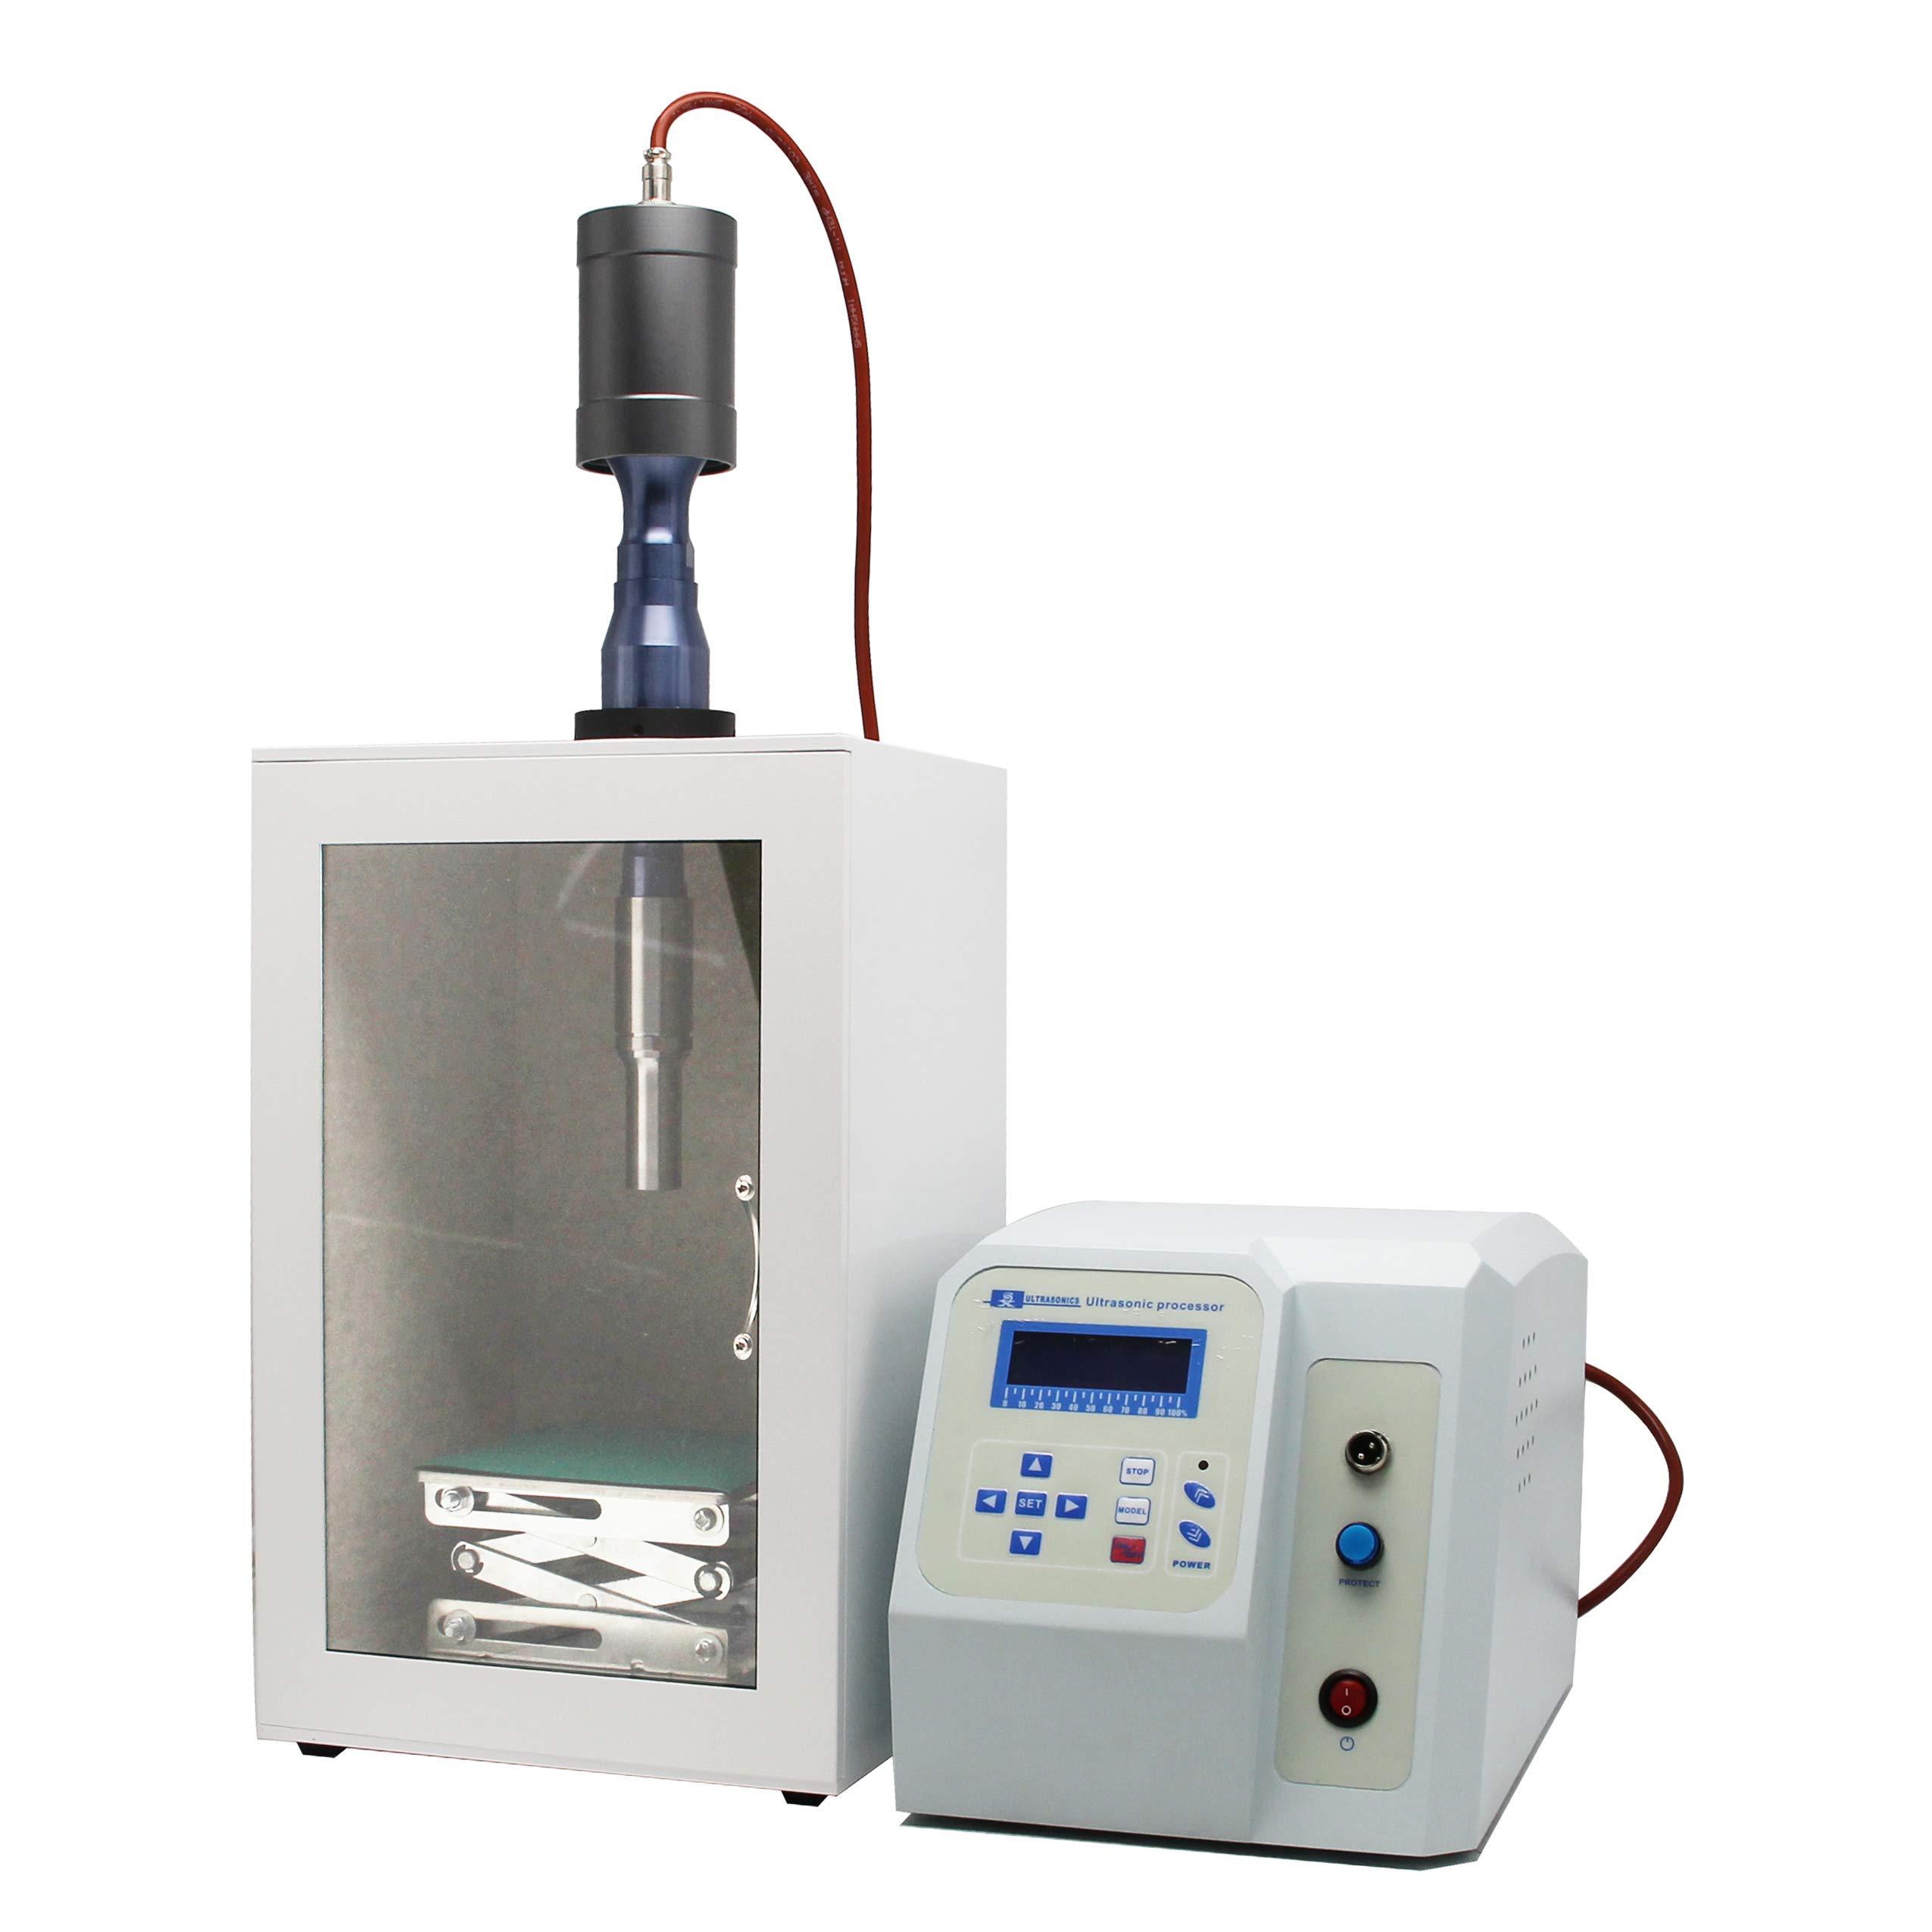 Ultrasonic Homogenizer 1800W Lab Sonicator Processor Ultrasonic Cell Disruptor Handling Capacity 100ml—3000ml by BAOSHISHAN (Image #1)